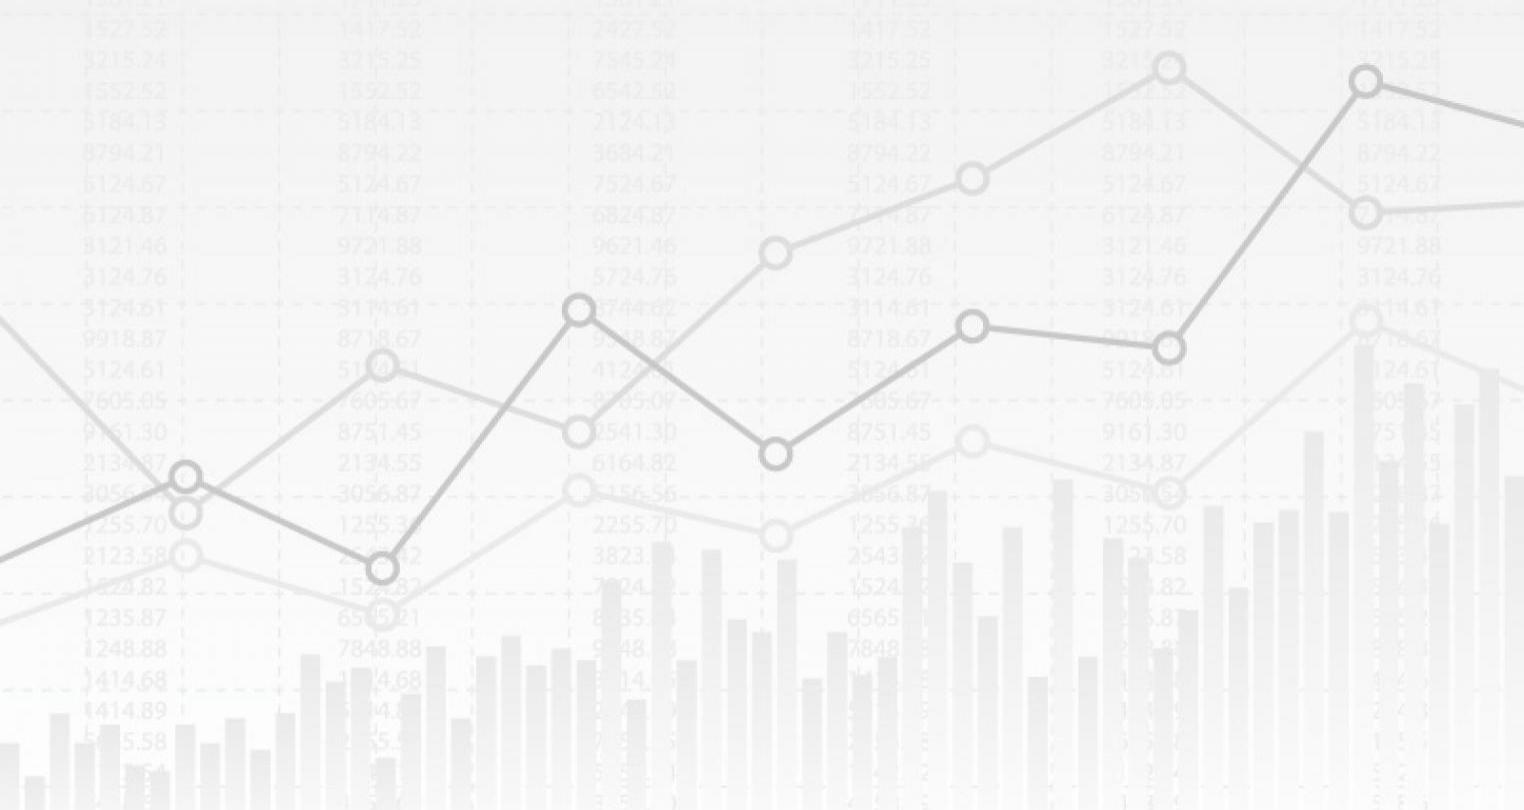 01. Market Knowledge & Keen Insight